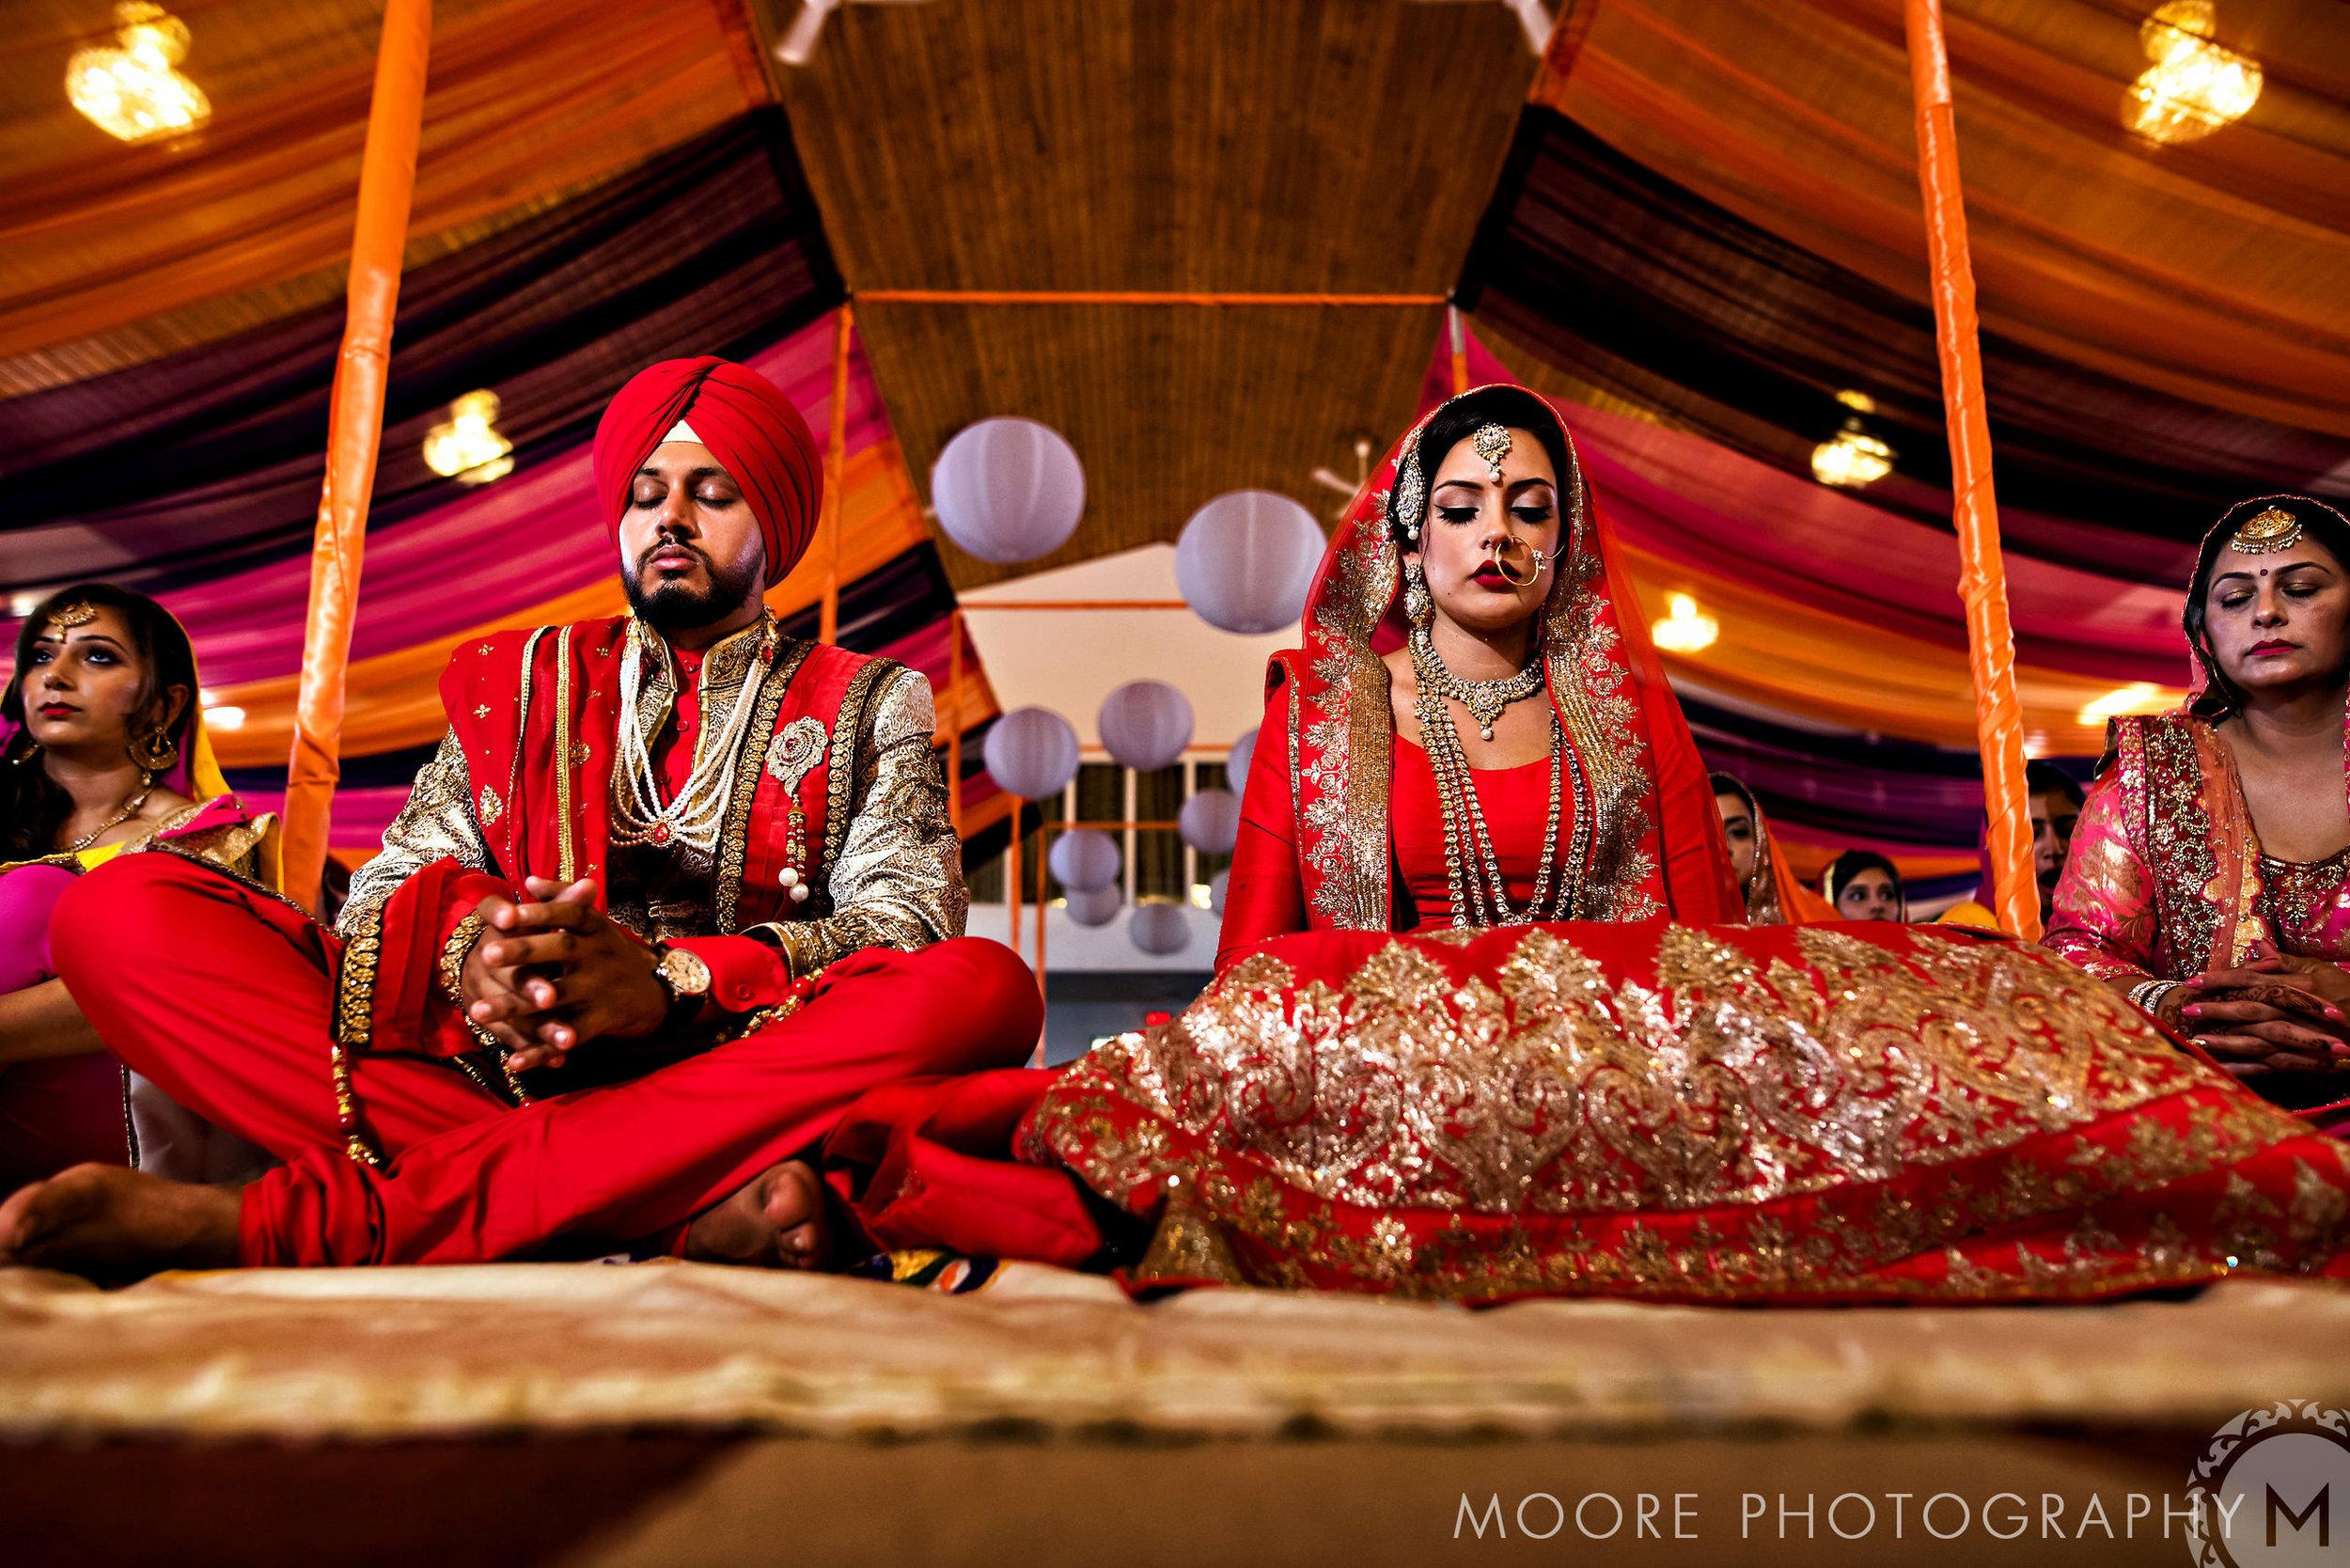 Toronto Makeup Artist, Toronto Wedding makeup artist, Markham Makeup Artist, Sikh Wedding Makeup Artist, indian wedding makeup artist toronto, sikh wedding makeup artist toronto, toronto punjabi wedding - sitting.jpg